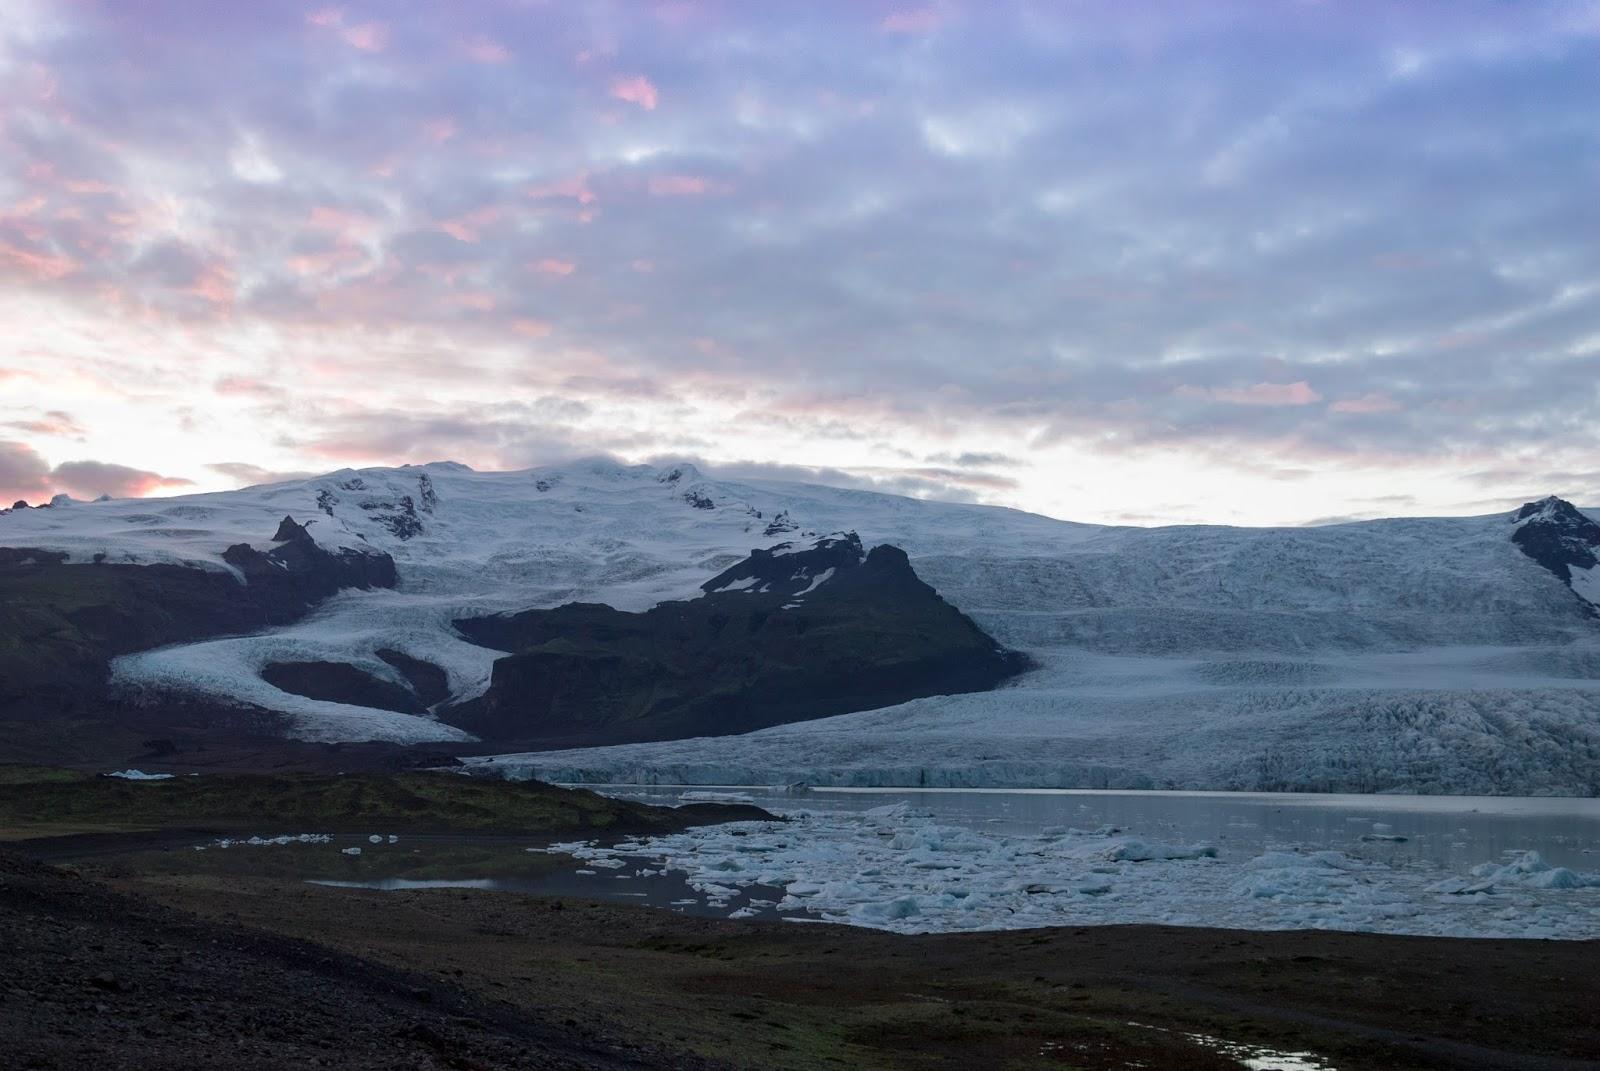 Islandia, lodowa laguna,  Fjallsárlón, zachód słońca